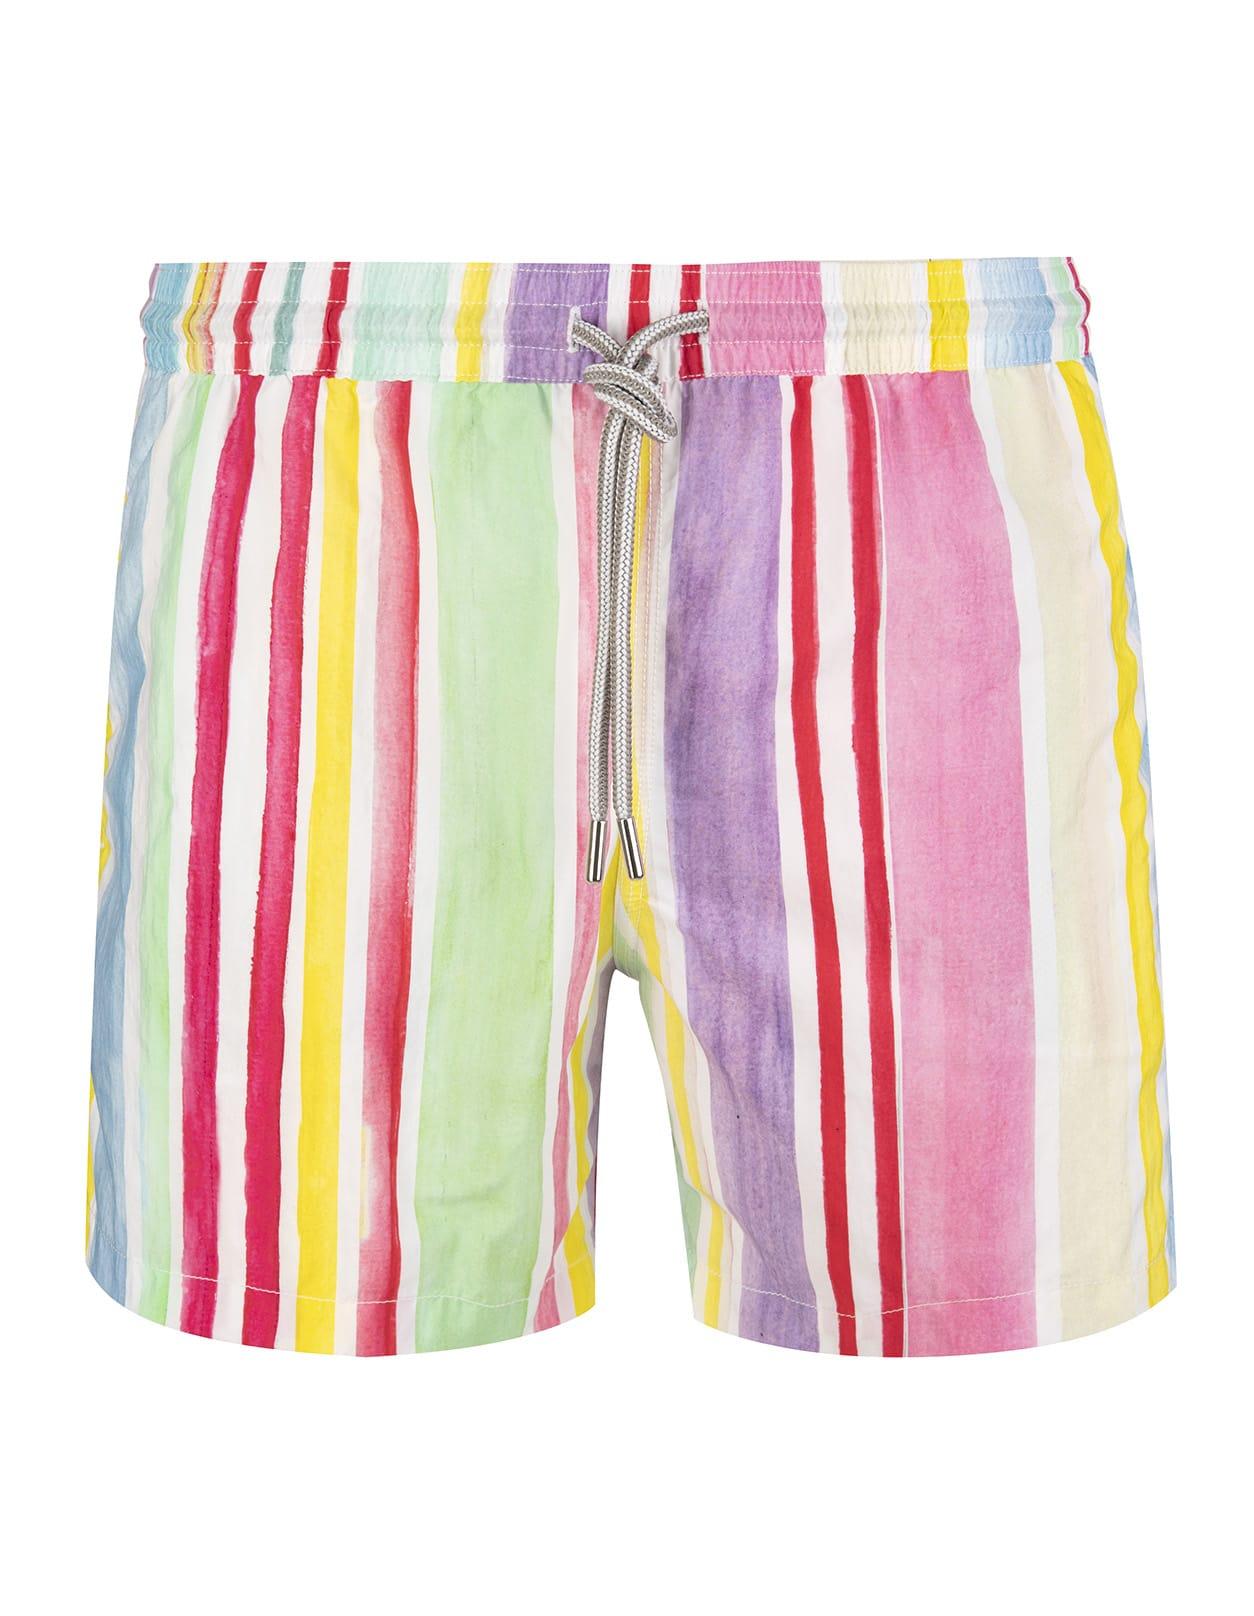 Pastel Striped Swimsuit